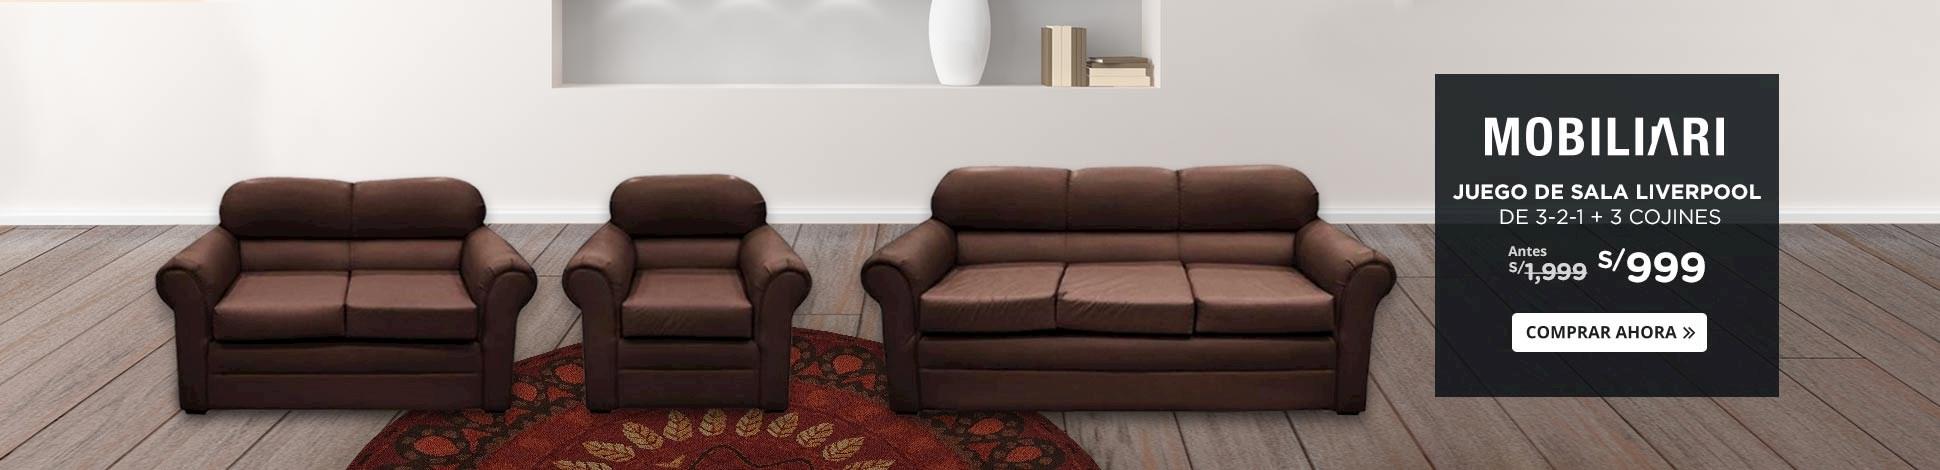 Mobiliari Tienda Online Oficial Juntoz Com # Muebles Liverpool Salas